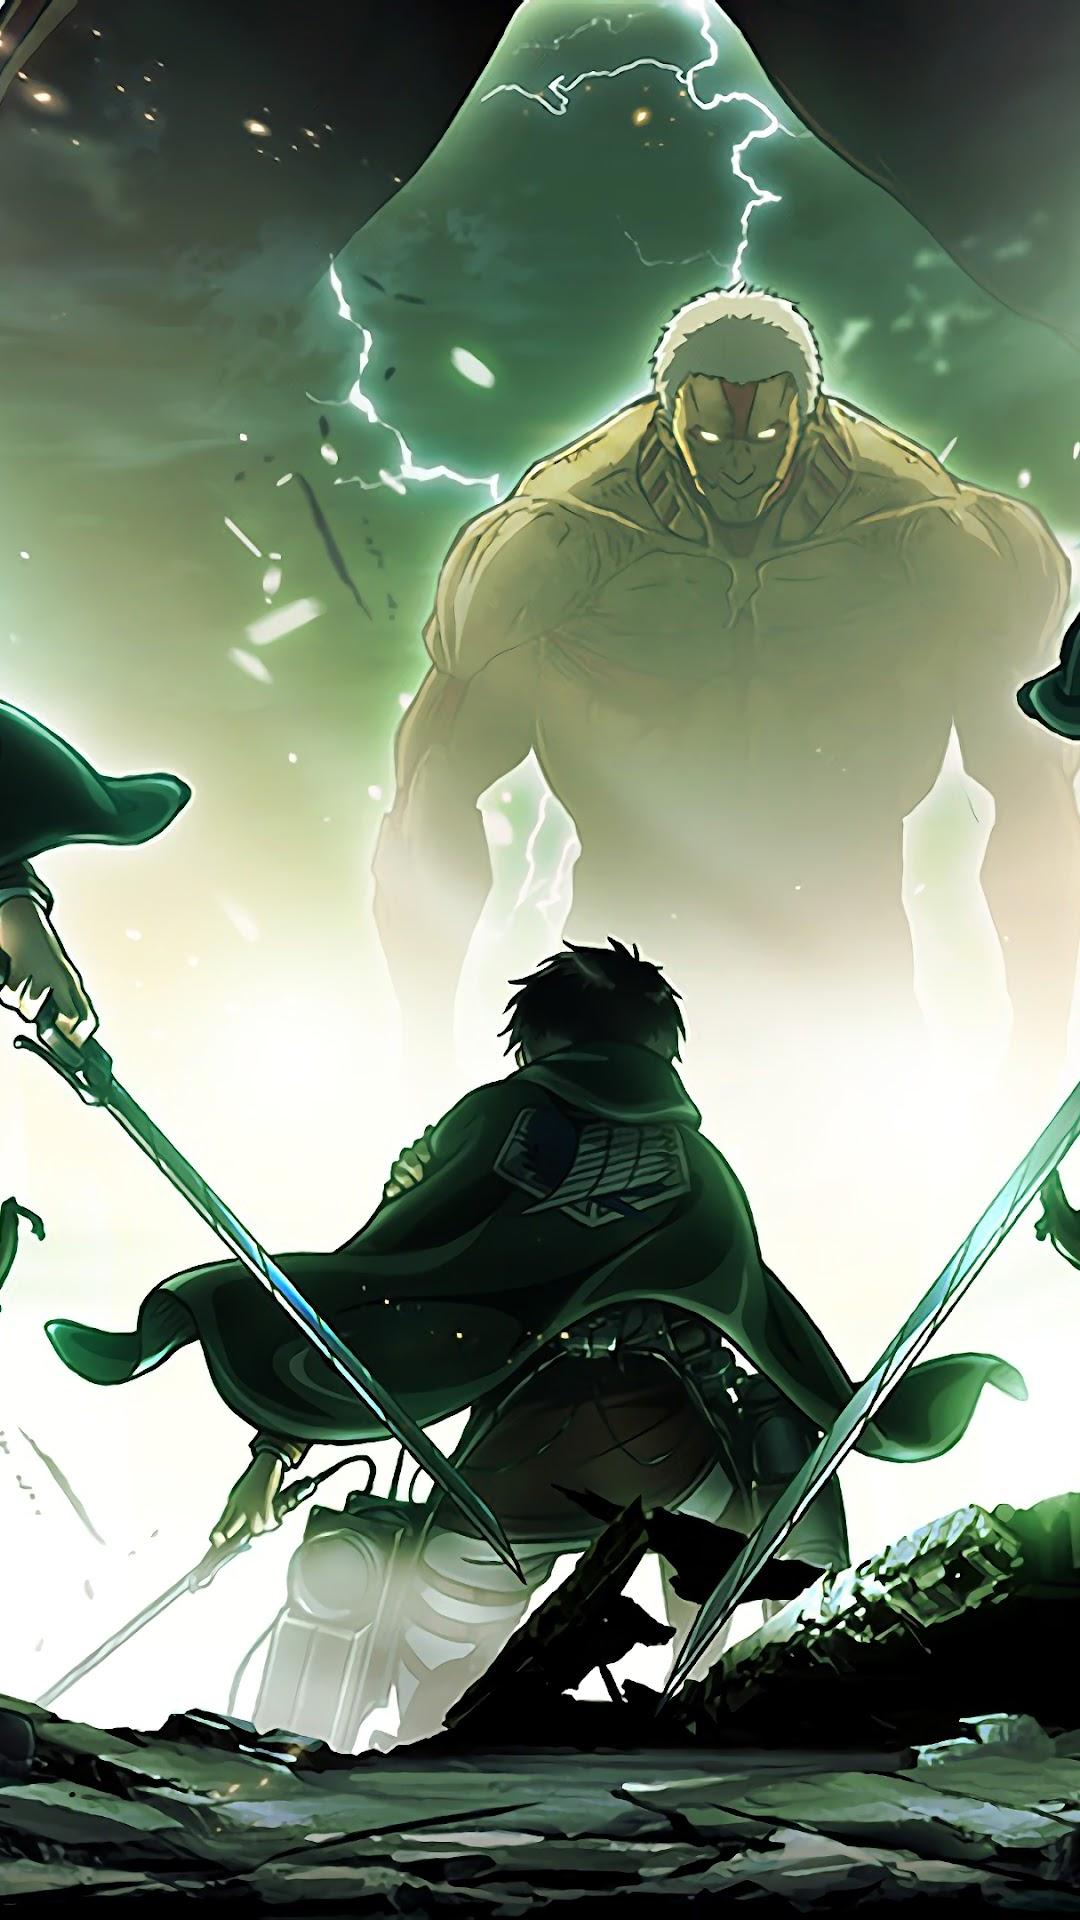 Armin Mikasa Eren Colossal Titan Attack On Titan 4k Wallpaper 166